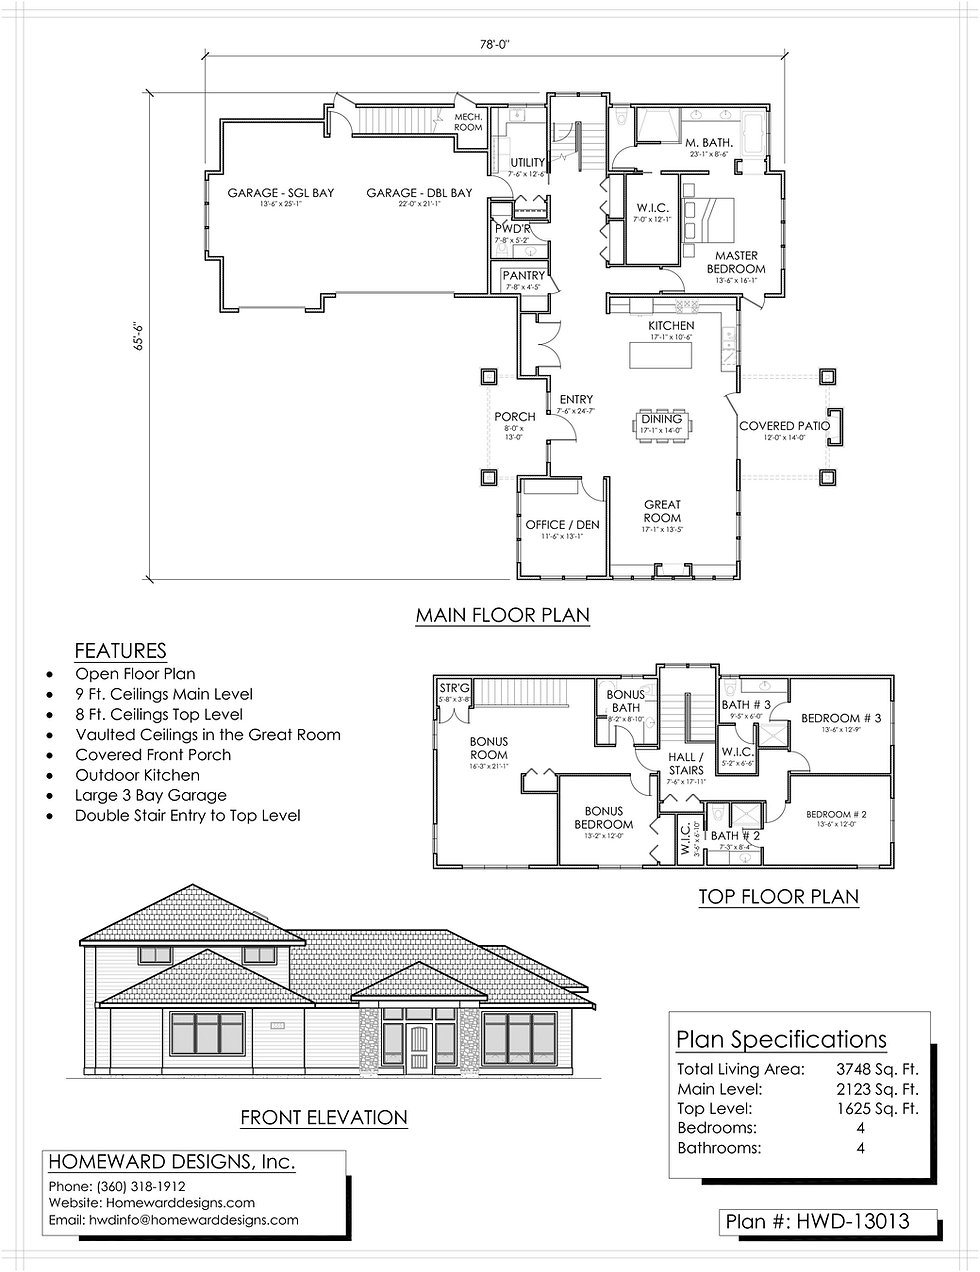 Single Family House Stock Plan